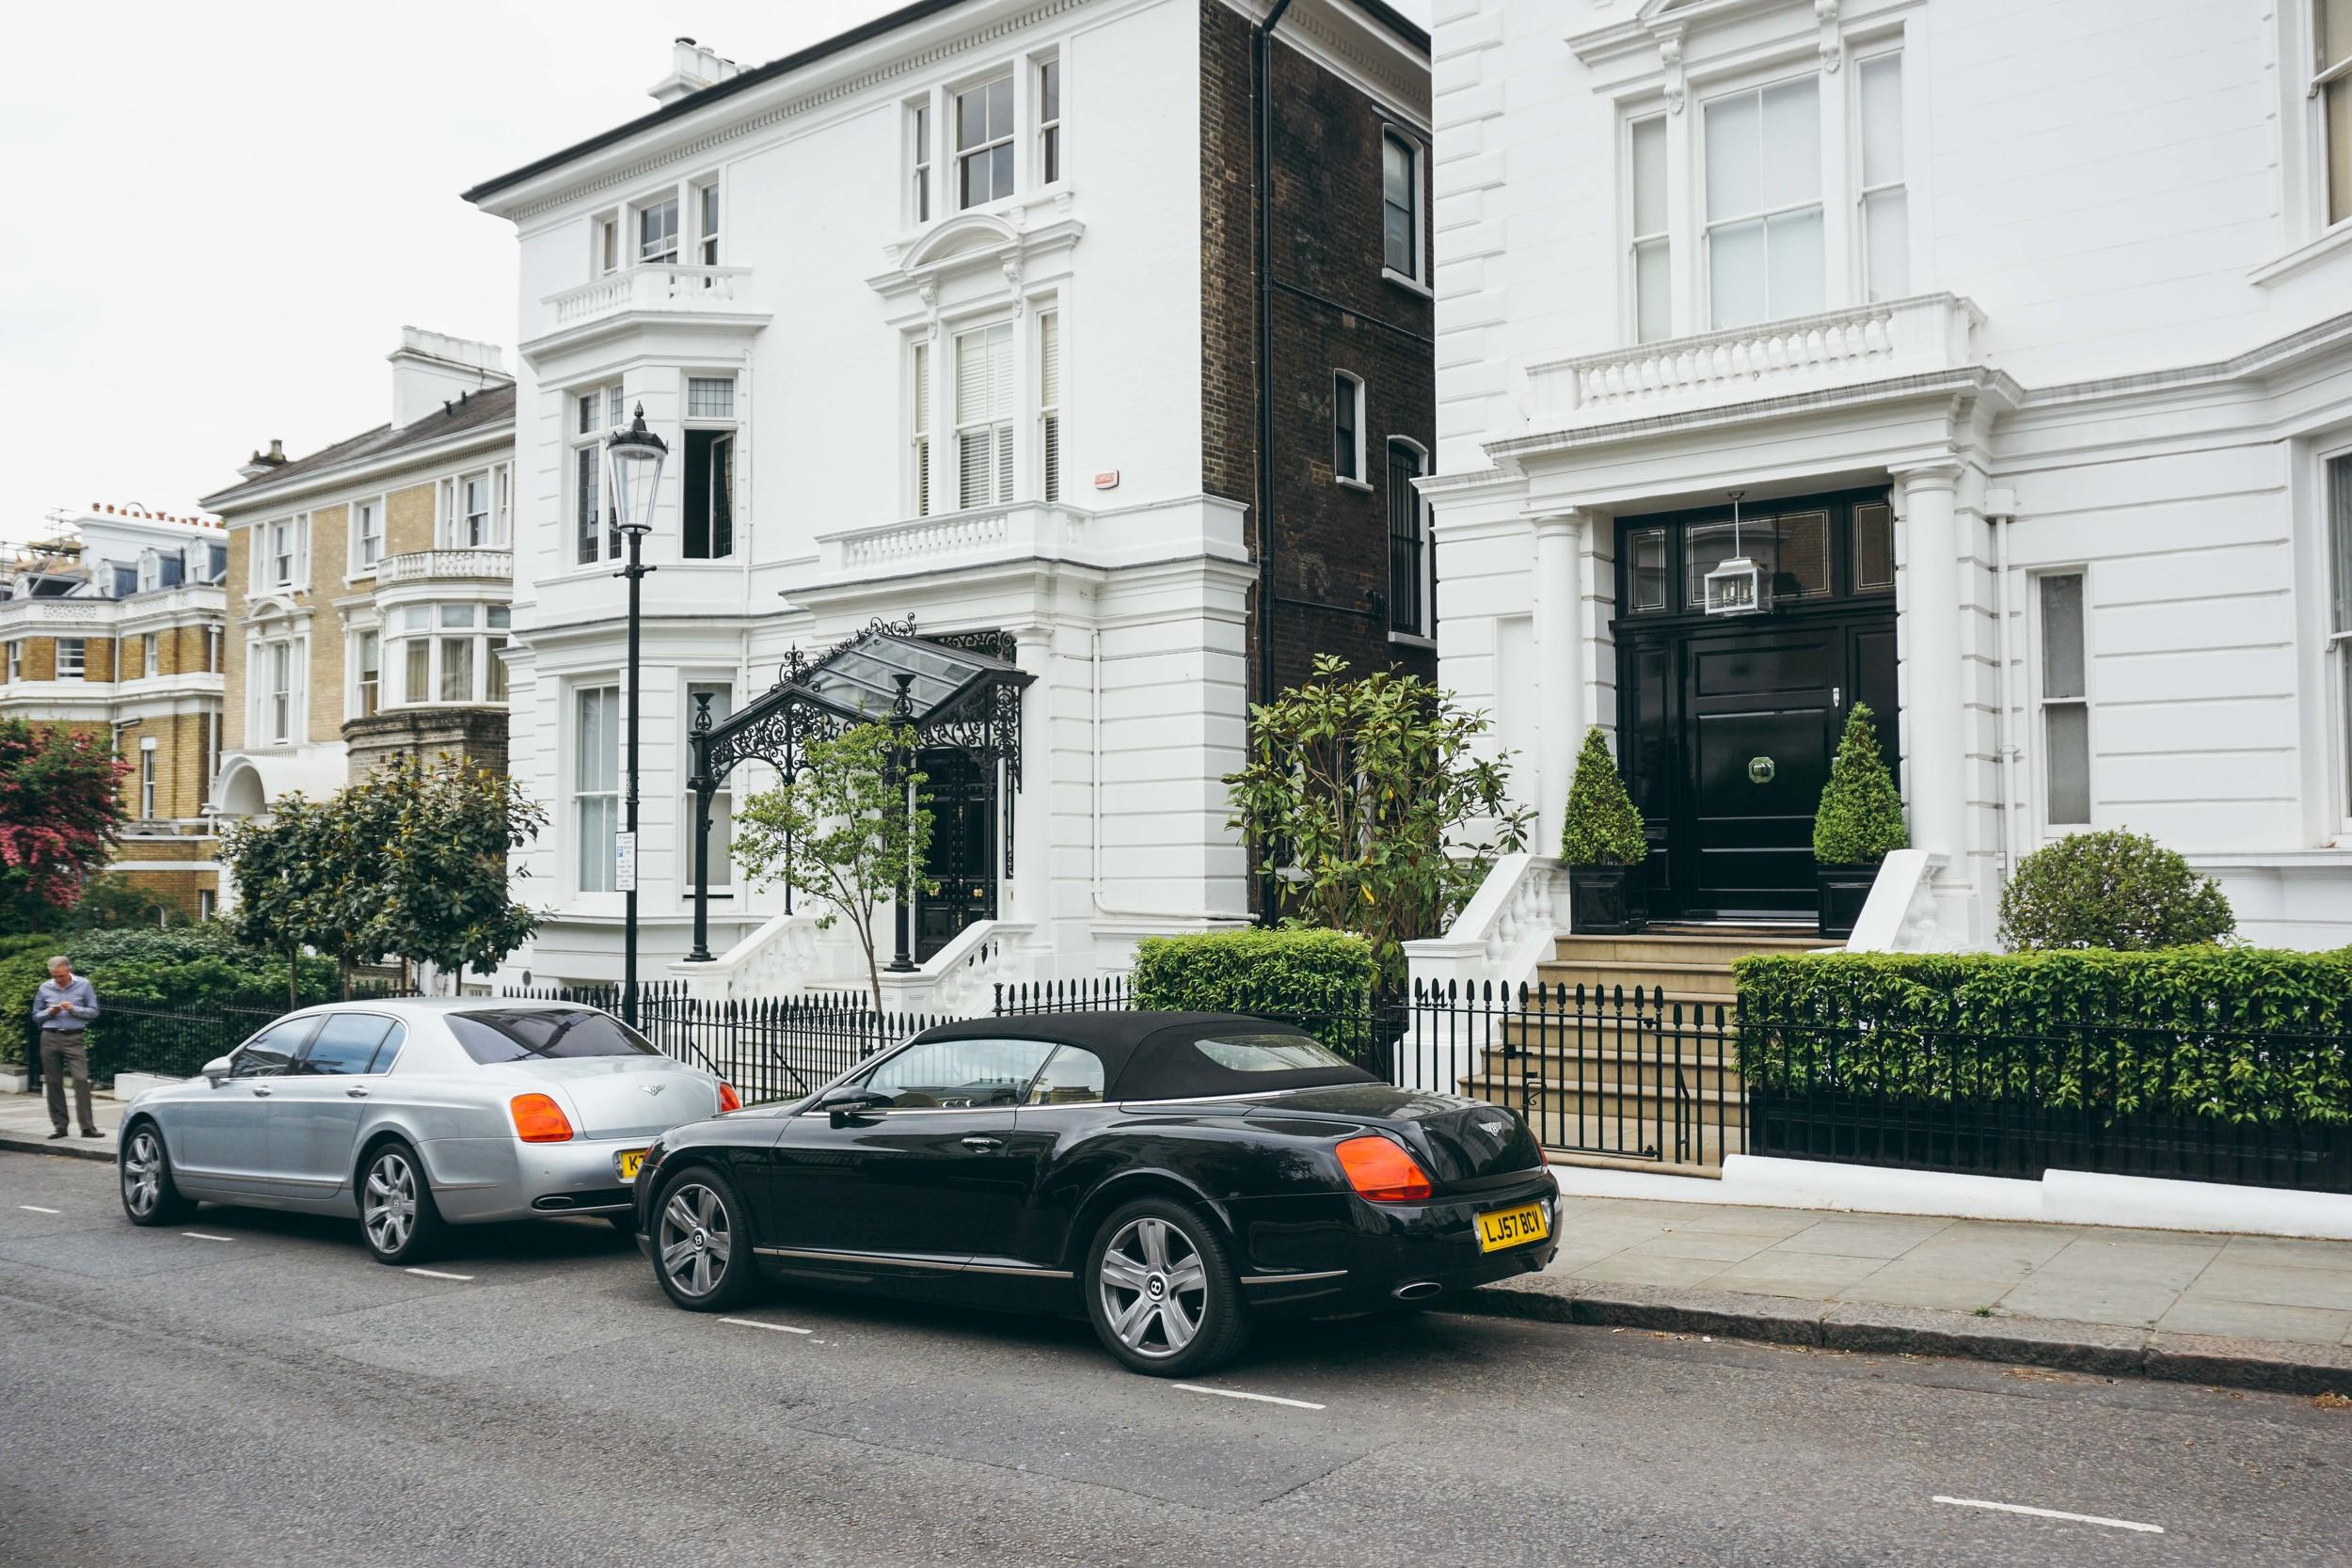 Luxury homes in Chelsea and Kensington